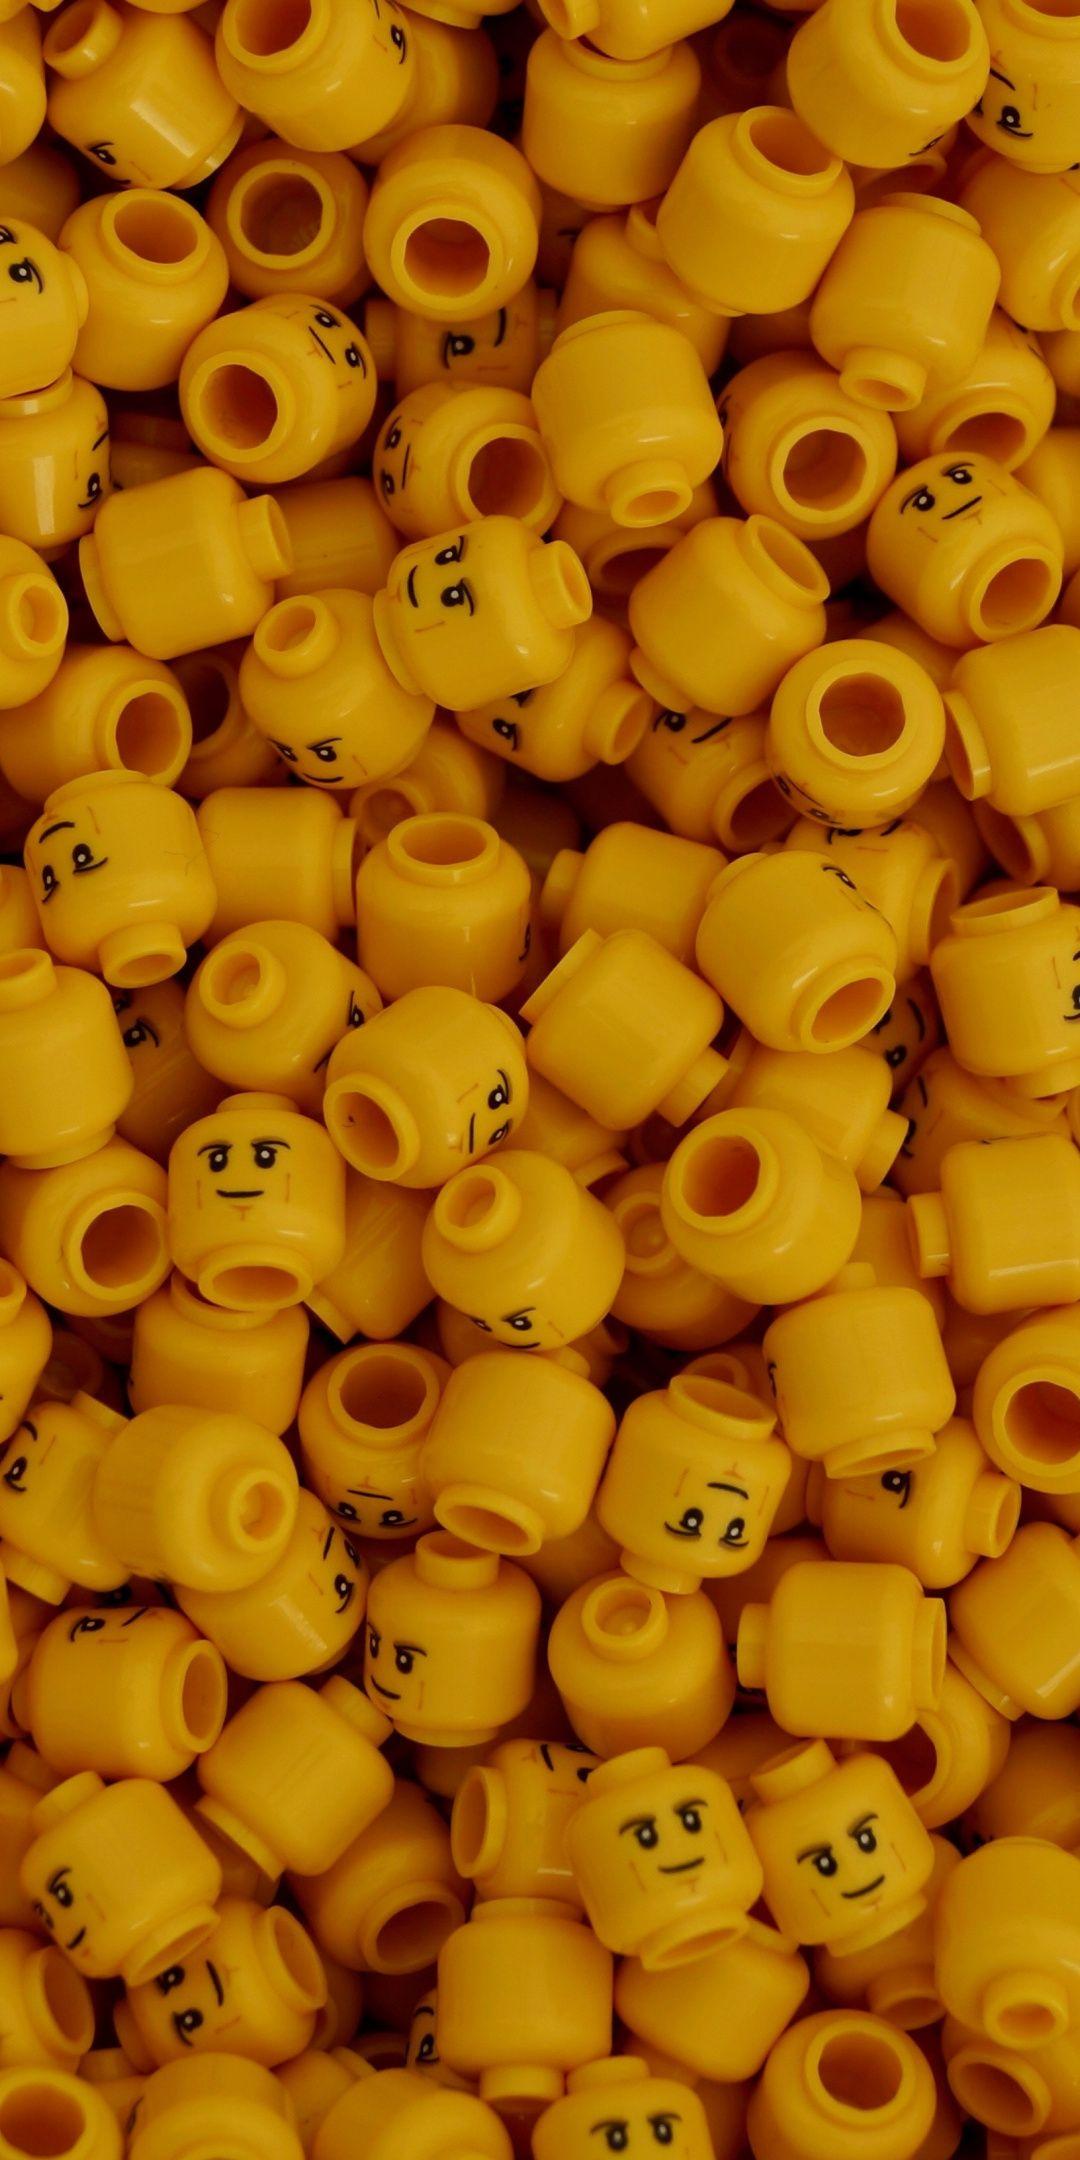 Yellow, Lego, toy, 1080x2160 wallpaper